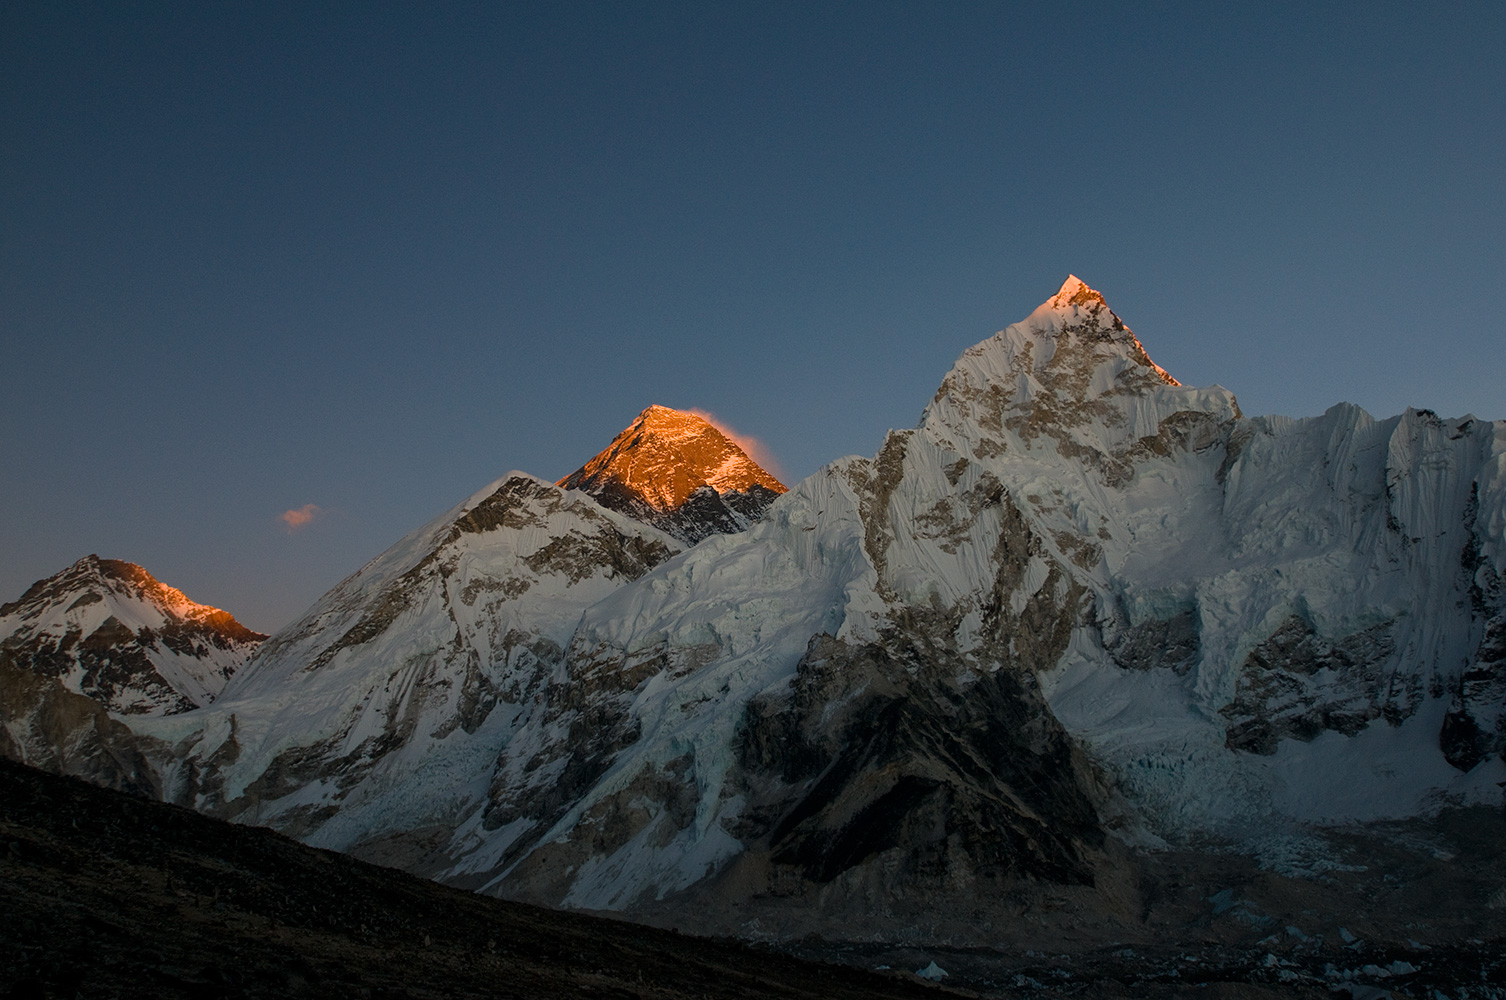 At sunset, from Kala PattarNikon D300, 50mm